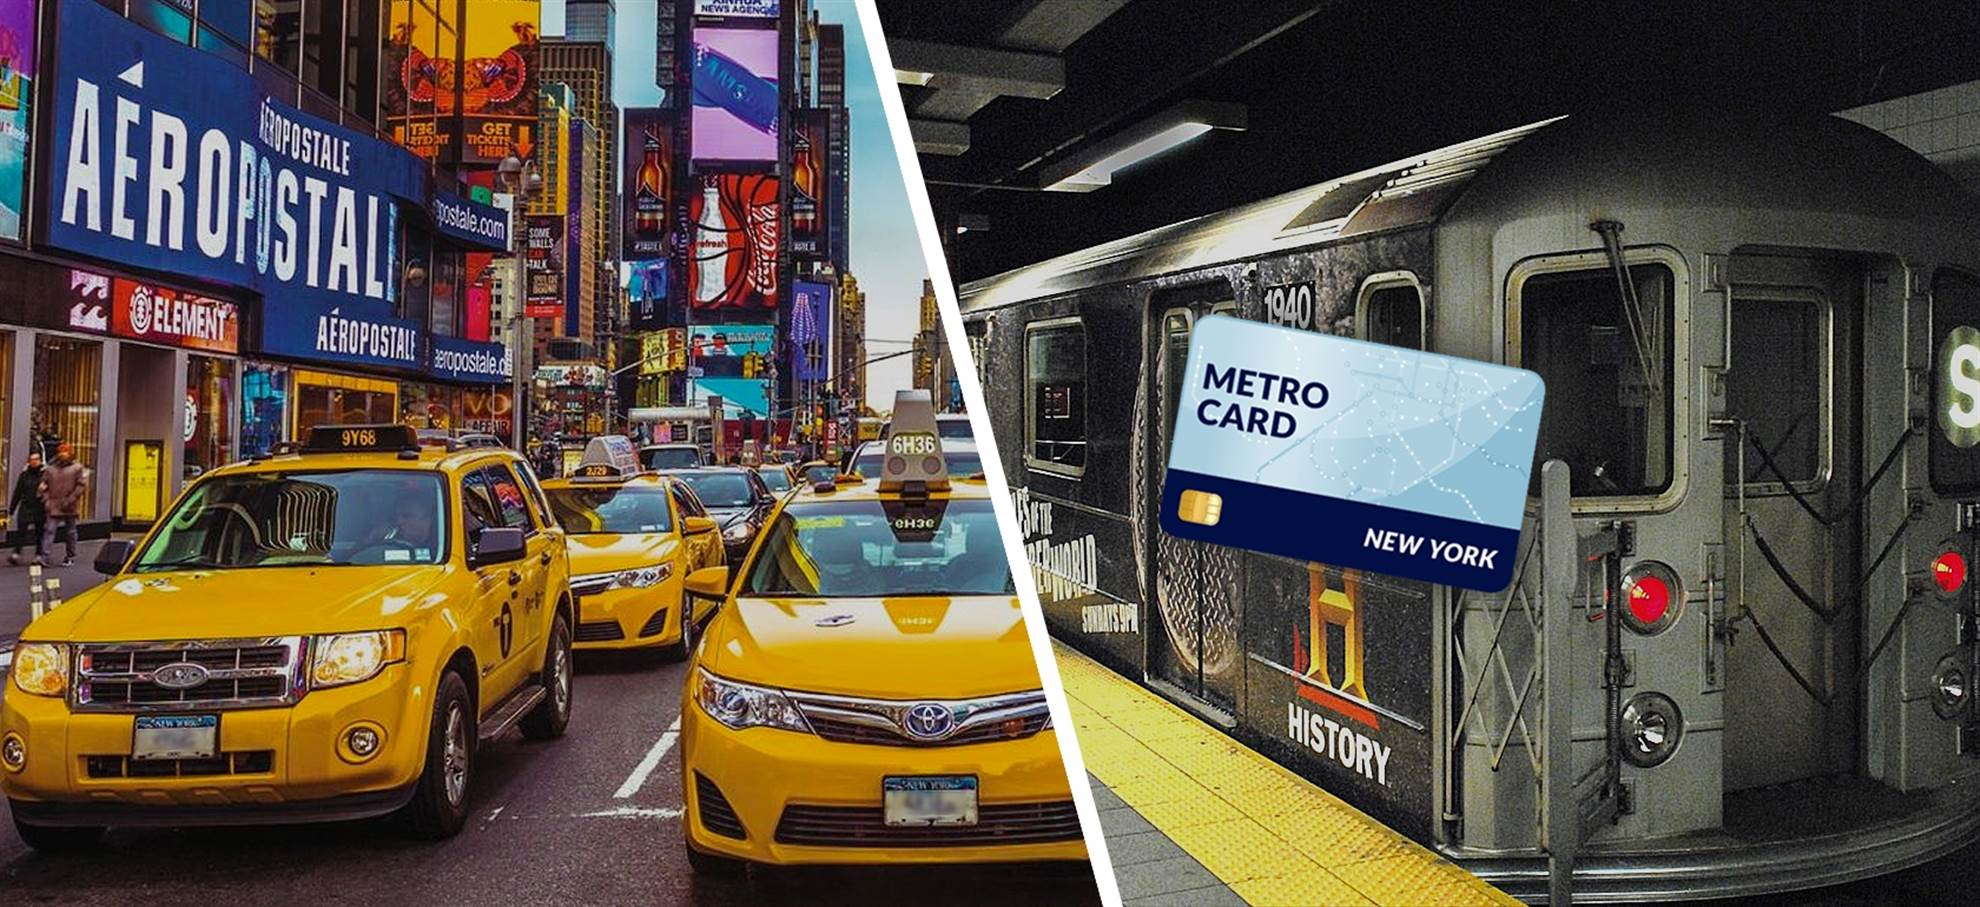 New York Travel Card